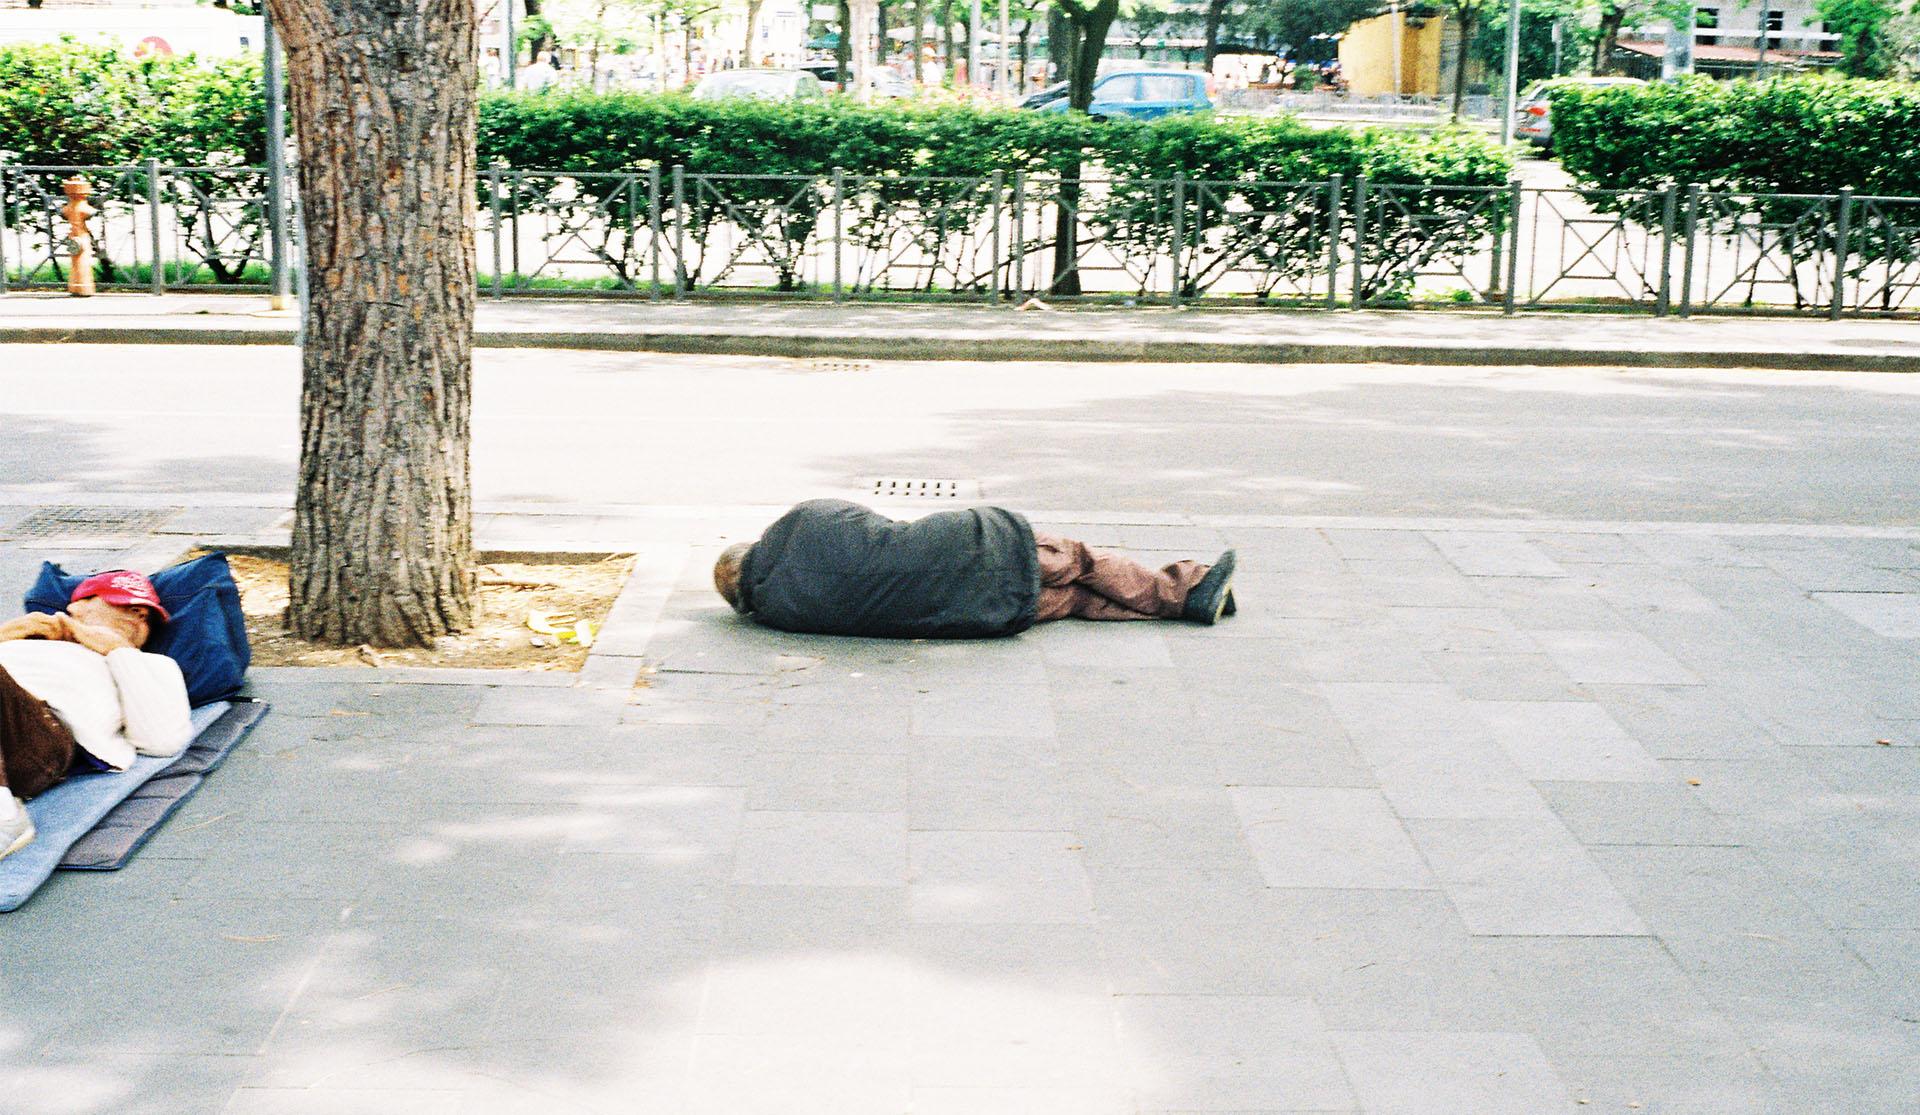 Sleeping locals.